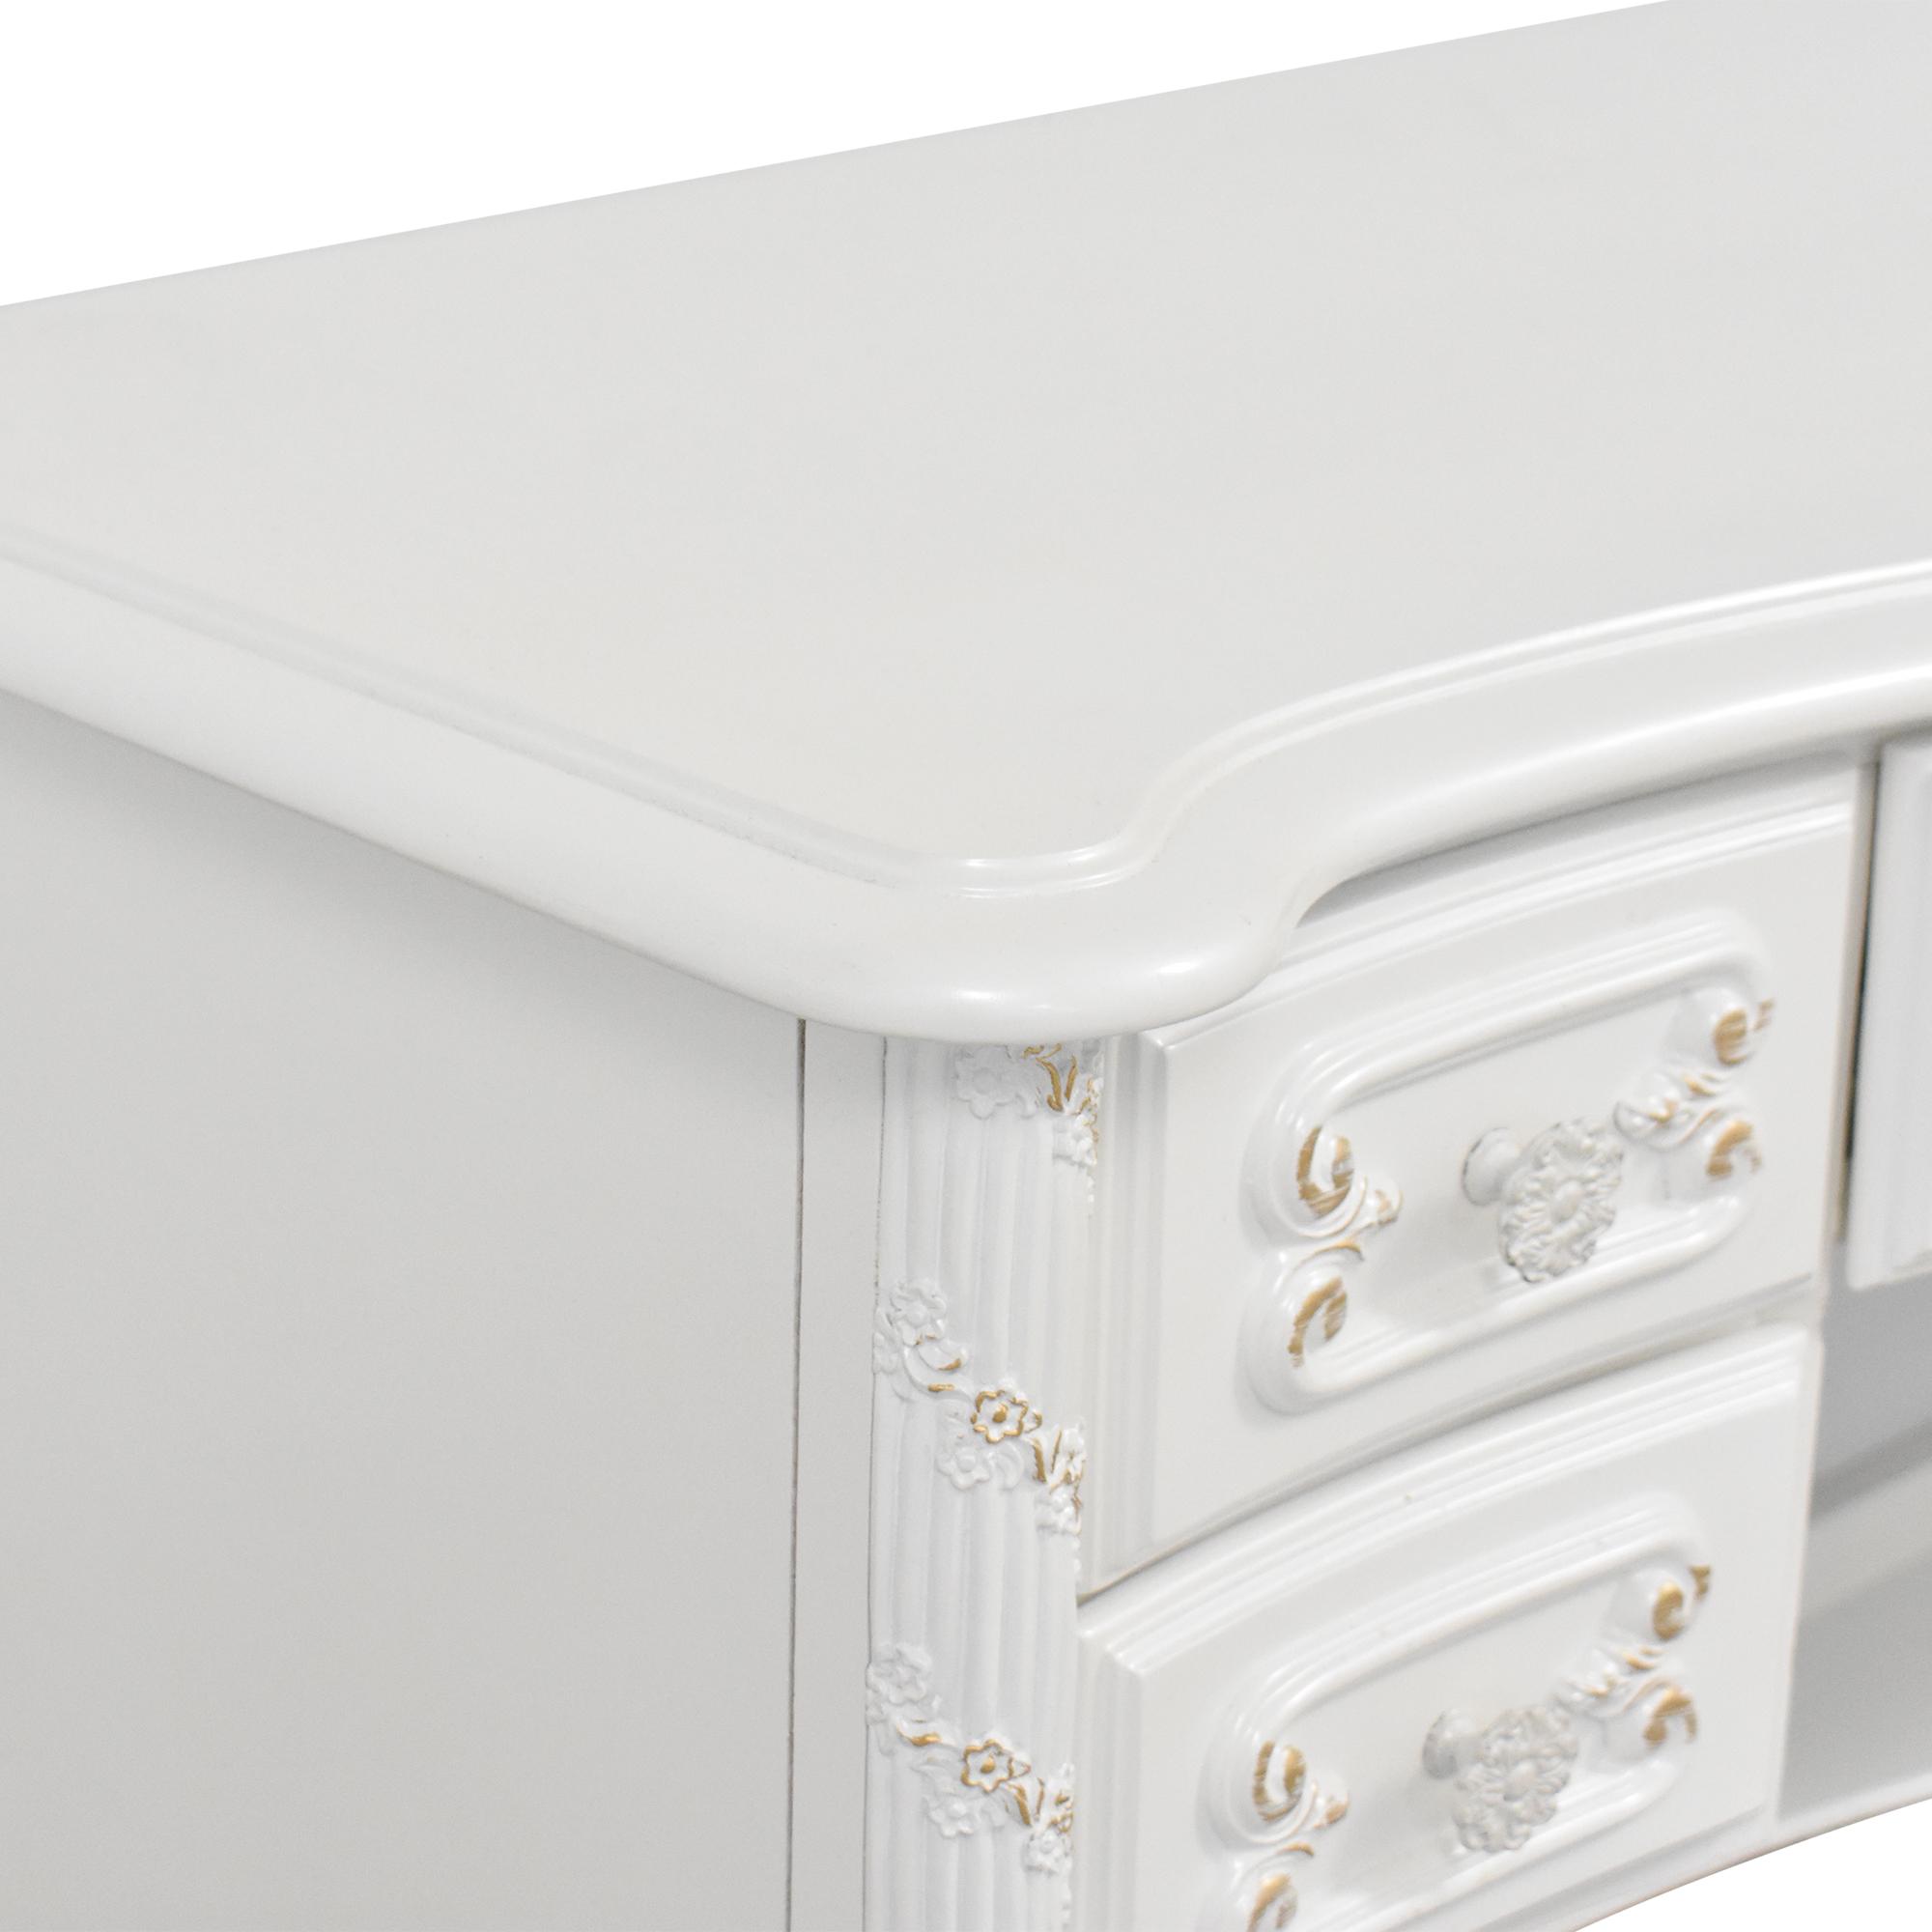 Acme Pearl Student Desk / Home Office Desks